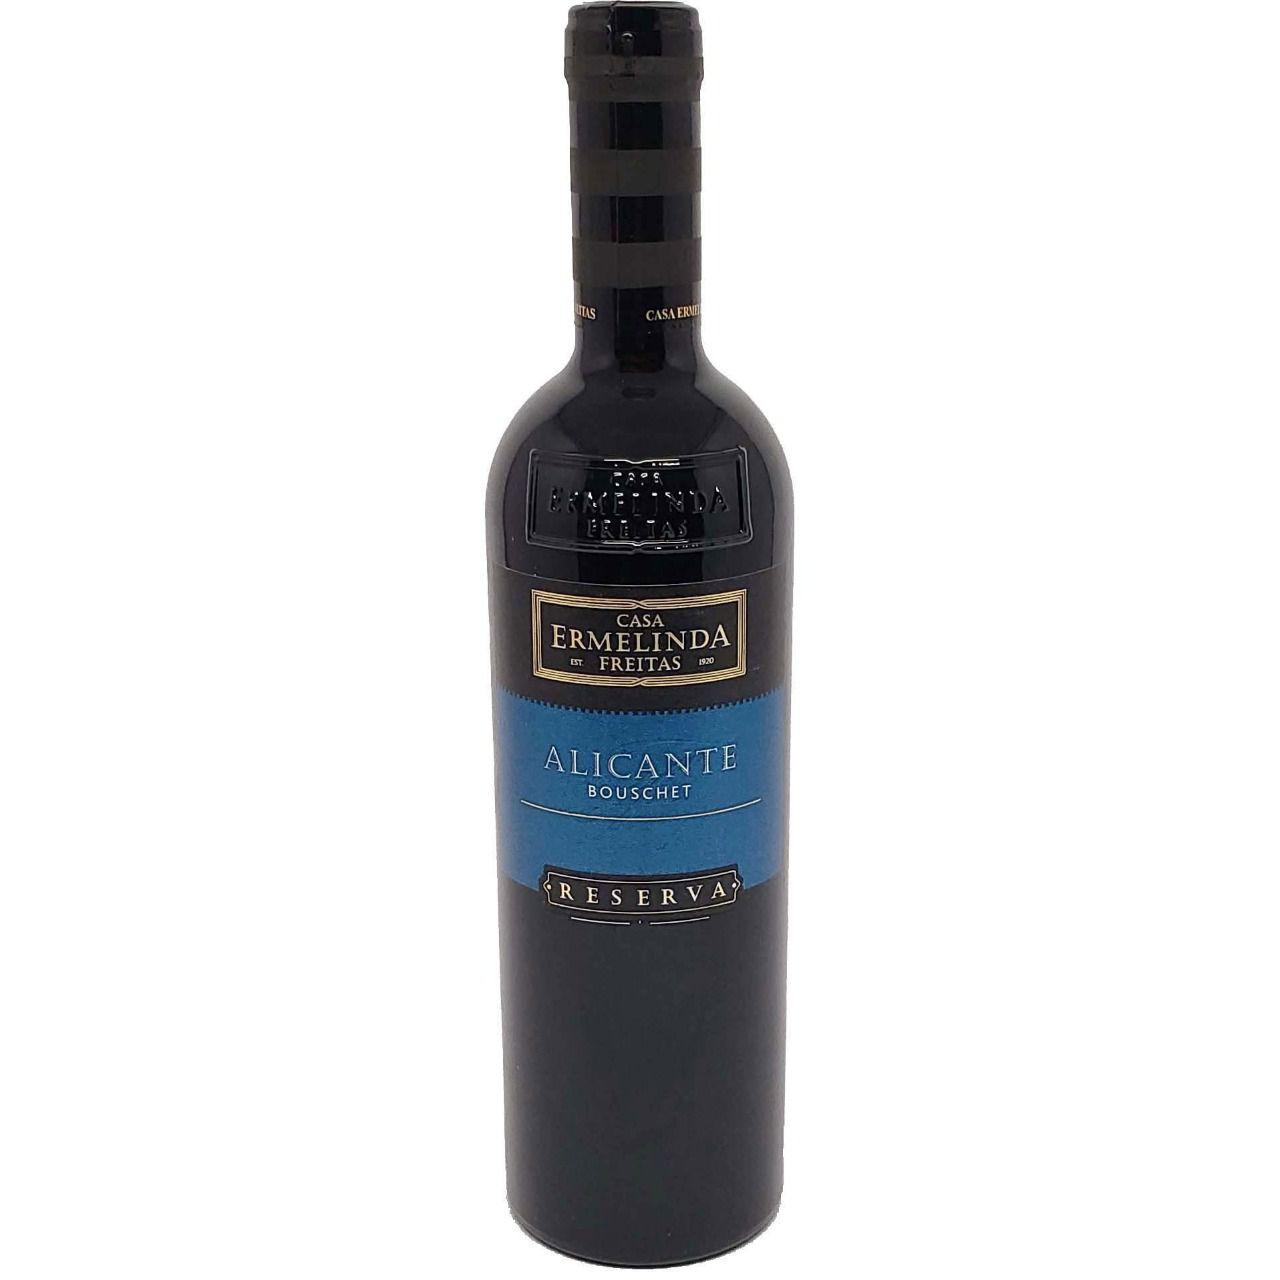 Vinho Tinto Reserva Alicante Bouschet Casa Ermelinda Freitas - 750ml -